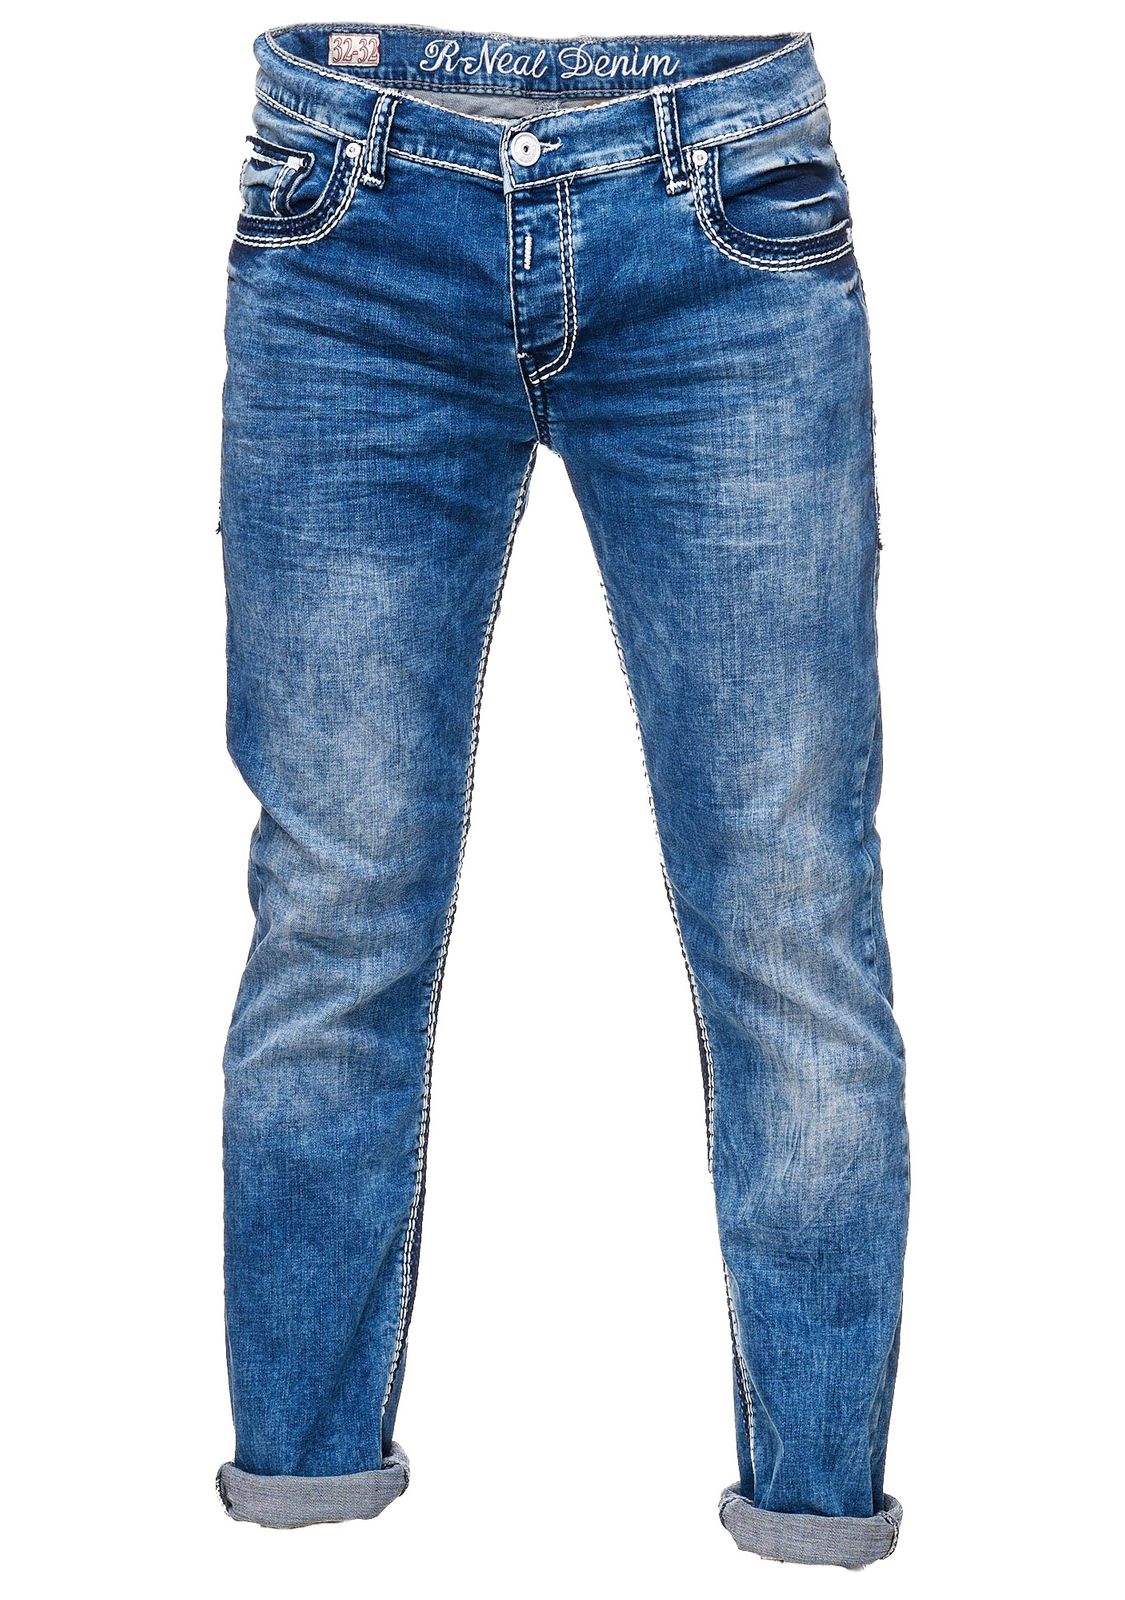 Rusty Neal Herren Jeans Hose 7444-Mix